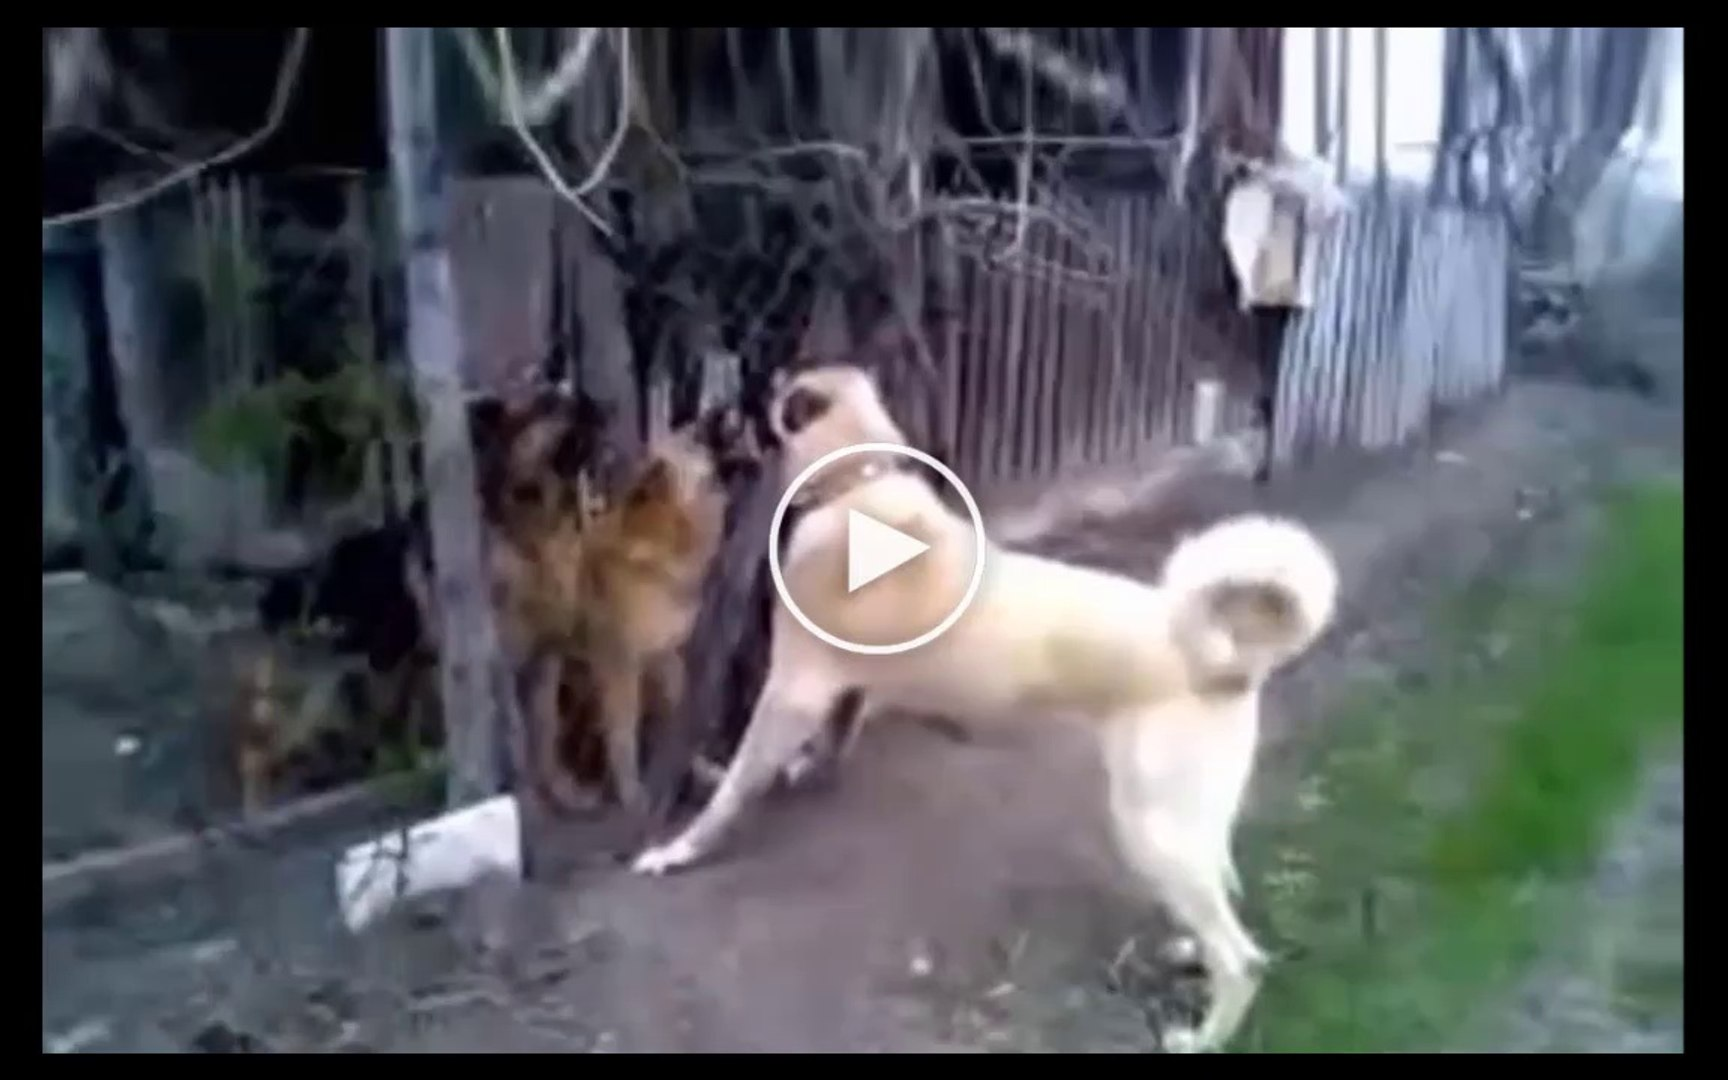 SiMiT KUYRUK COBAN KOPEGi vs ALMAN KURDU - ANATOLiAN SHEPHERD DOG vs GERMAN SHEPHERD DOG